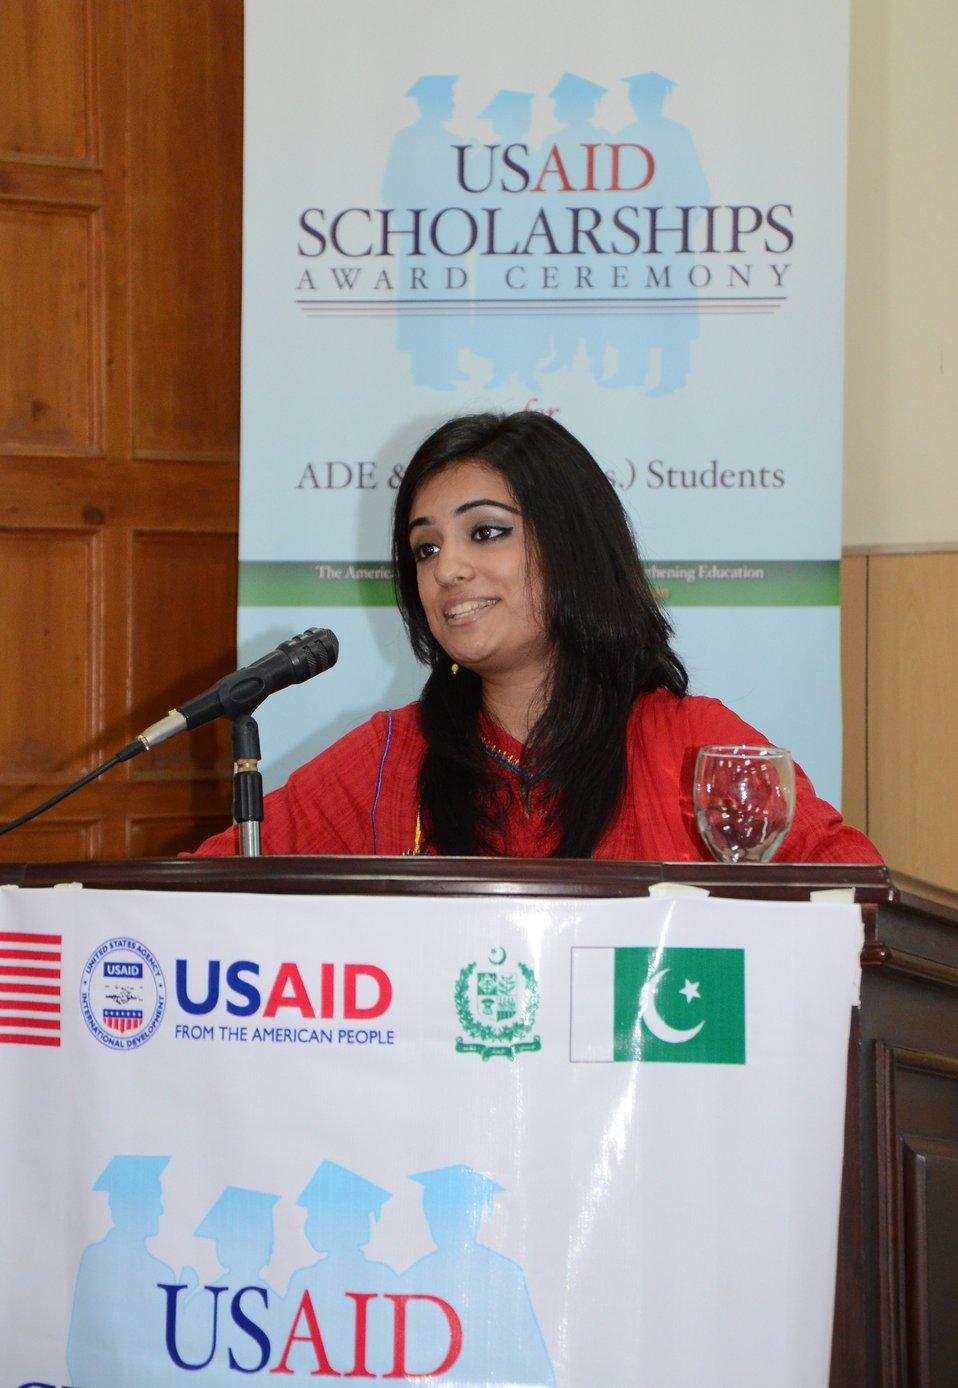 A USAID schoalrship recipient from Fatima Jinnah Women University